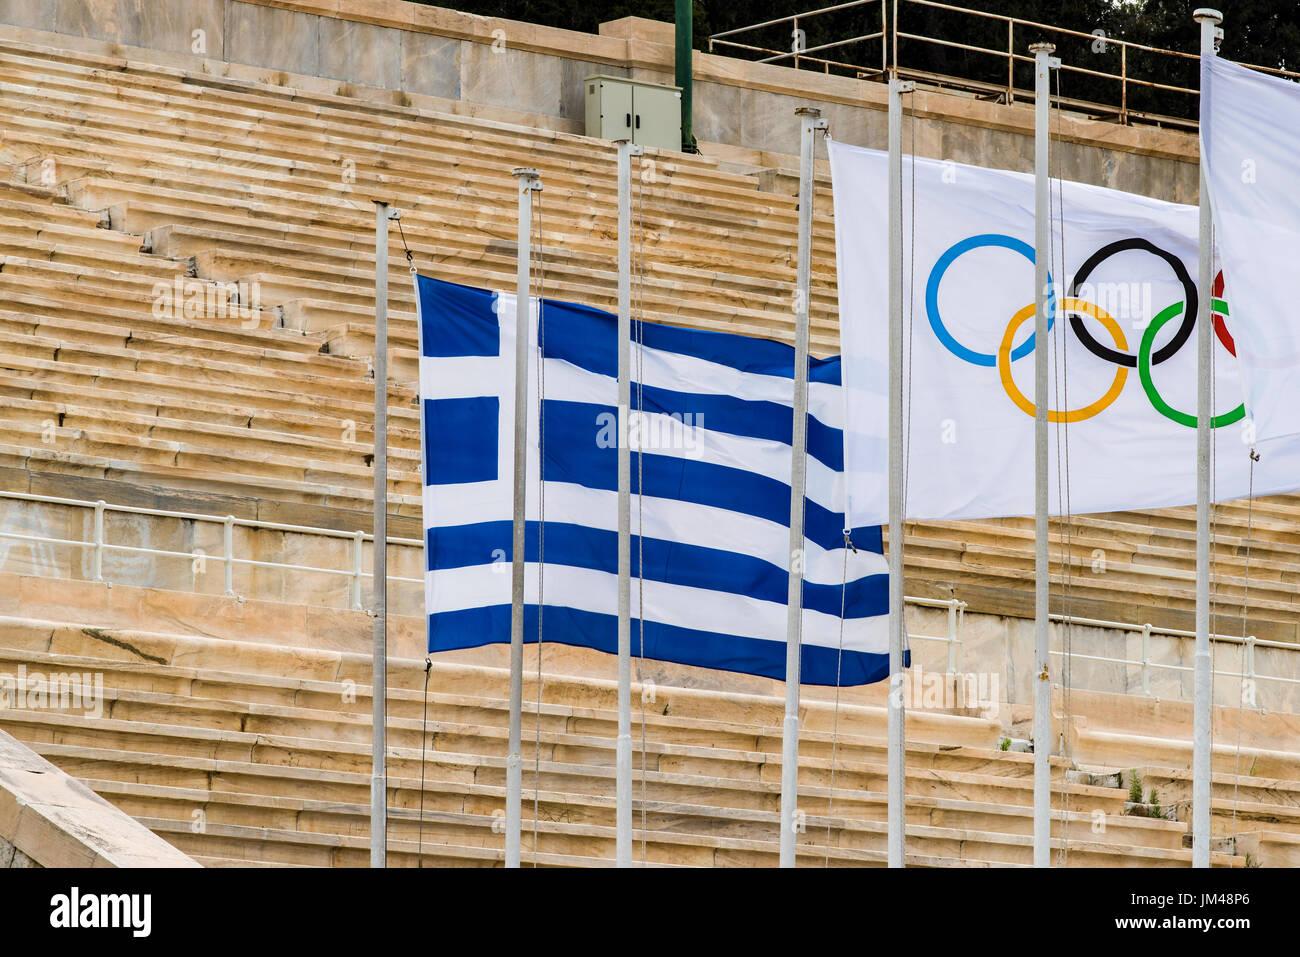 Greek flag and Olympic flag weaving at Panathenaic Stadium, Athens, Attica, Greece - Stock Image